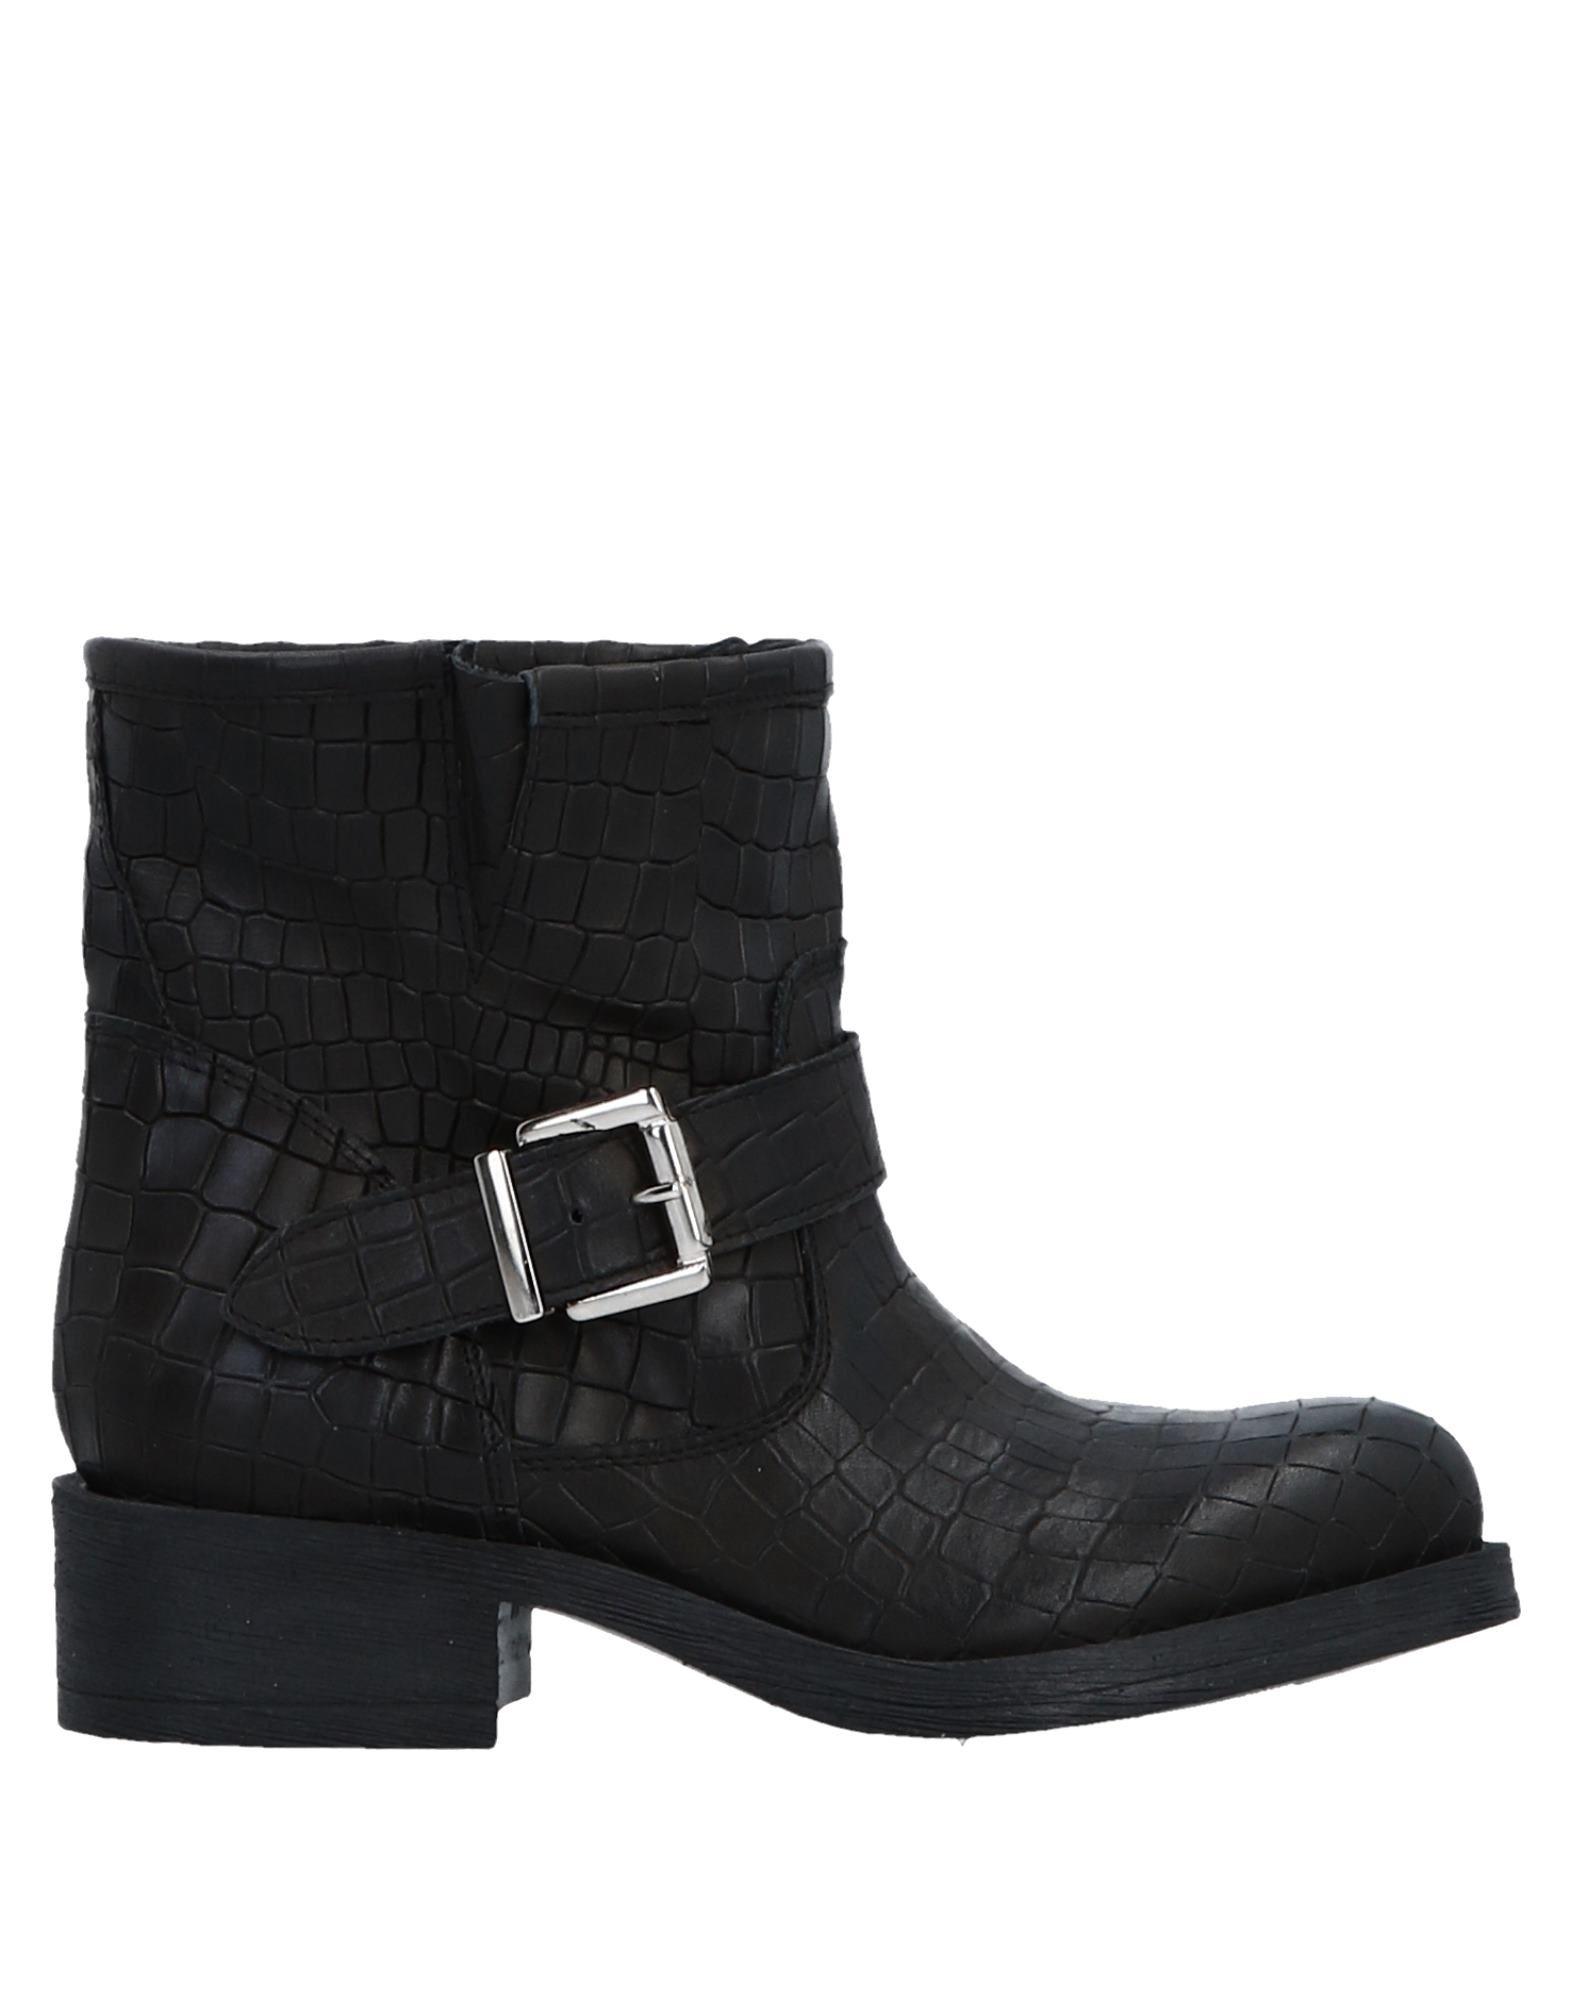 Moda Stivaletti Unlace Donna - 11522527UC